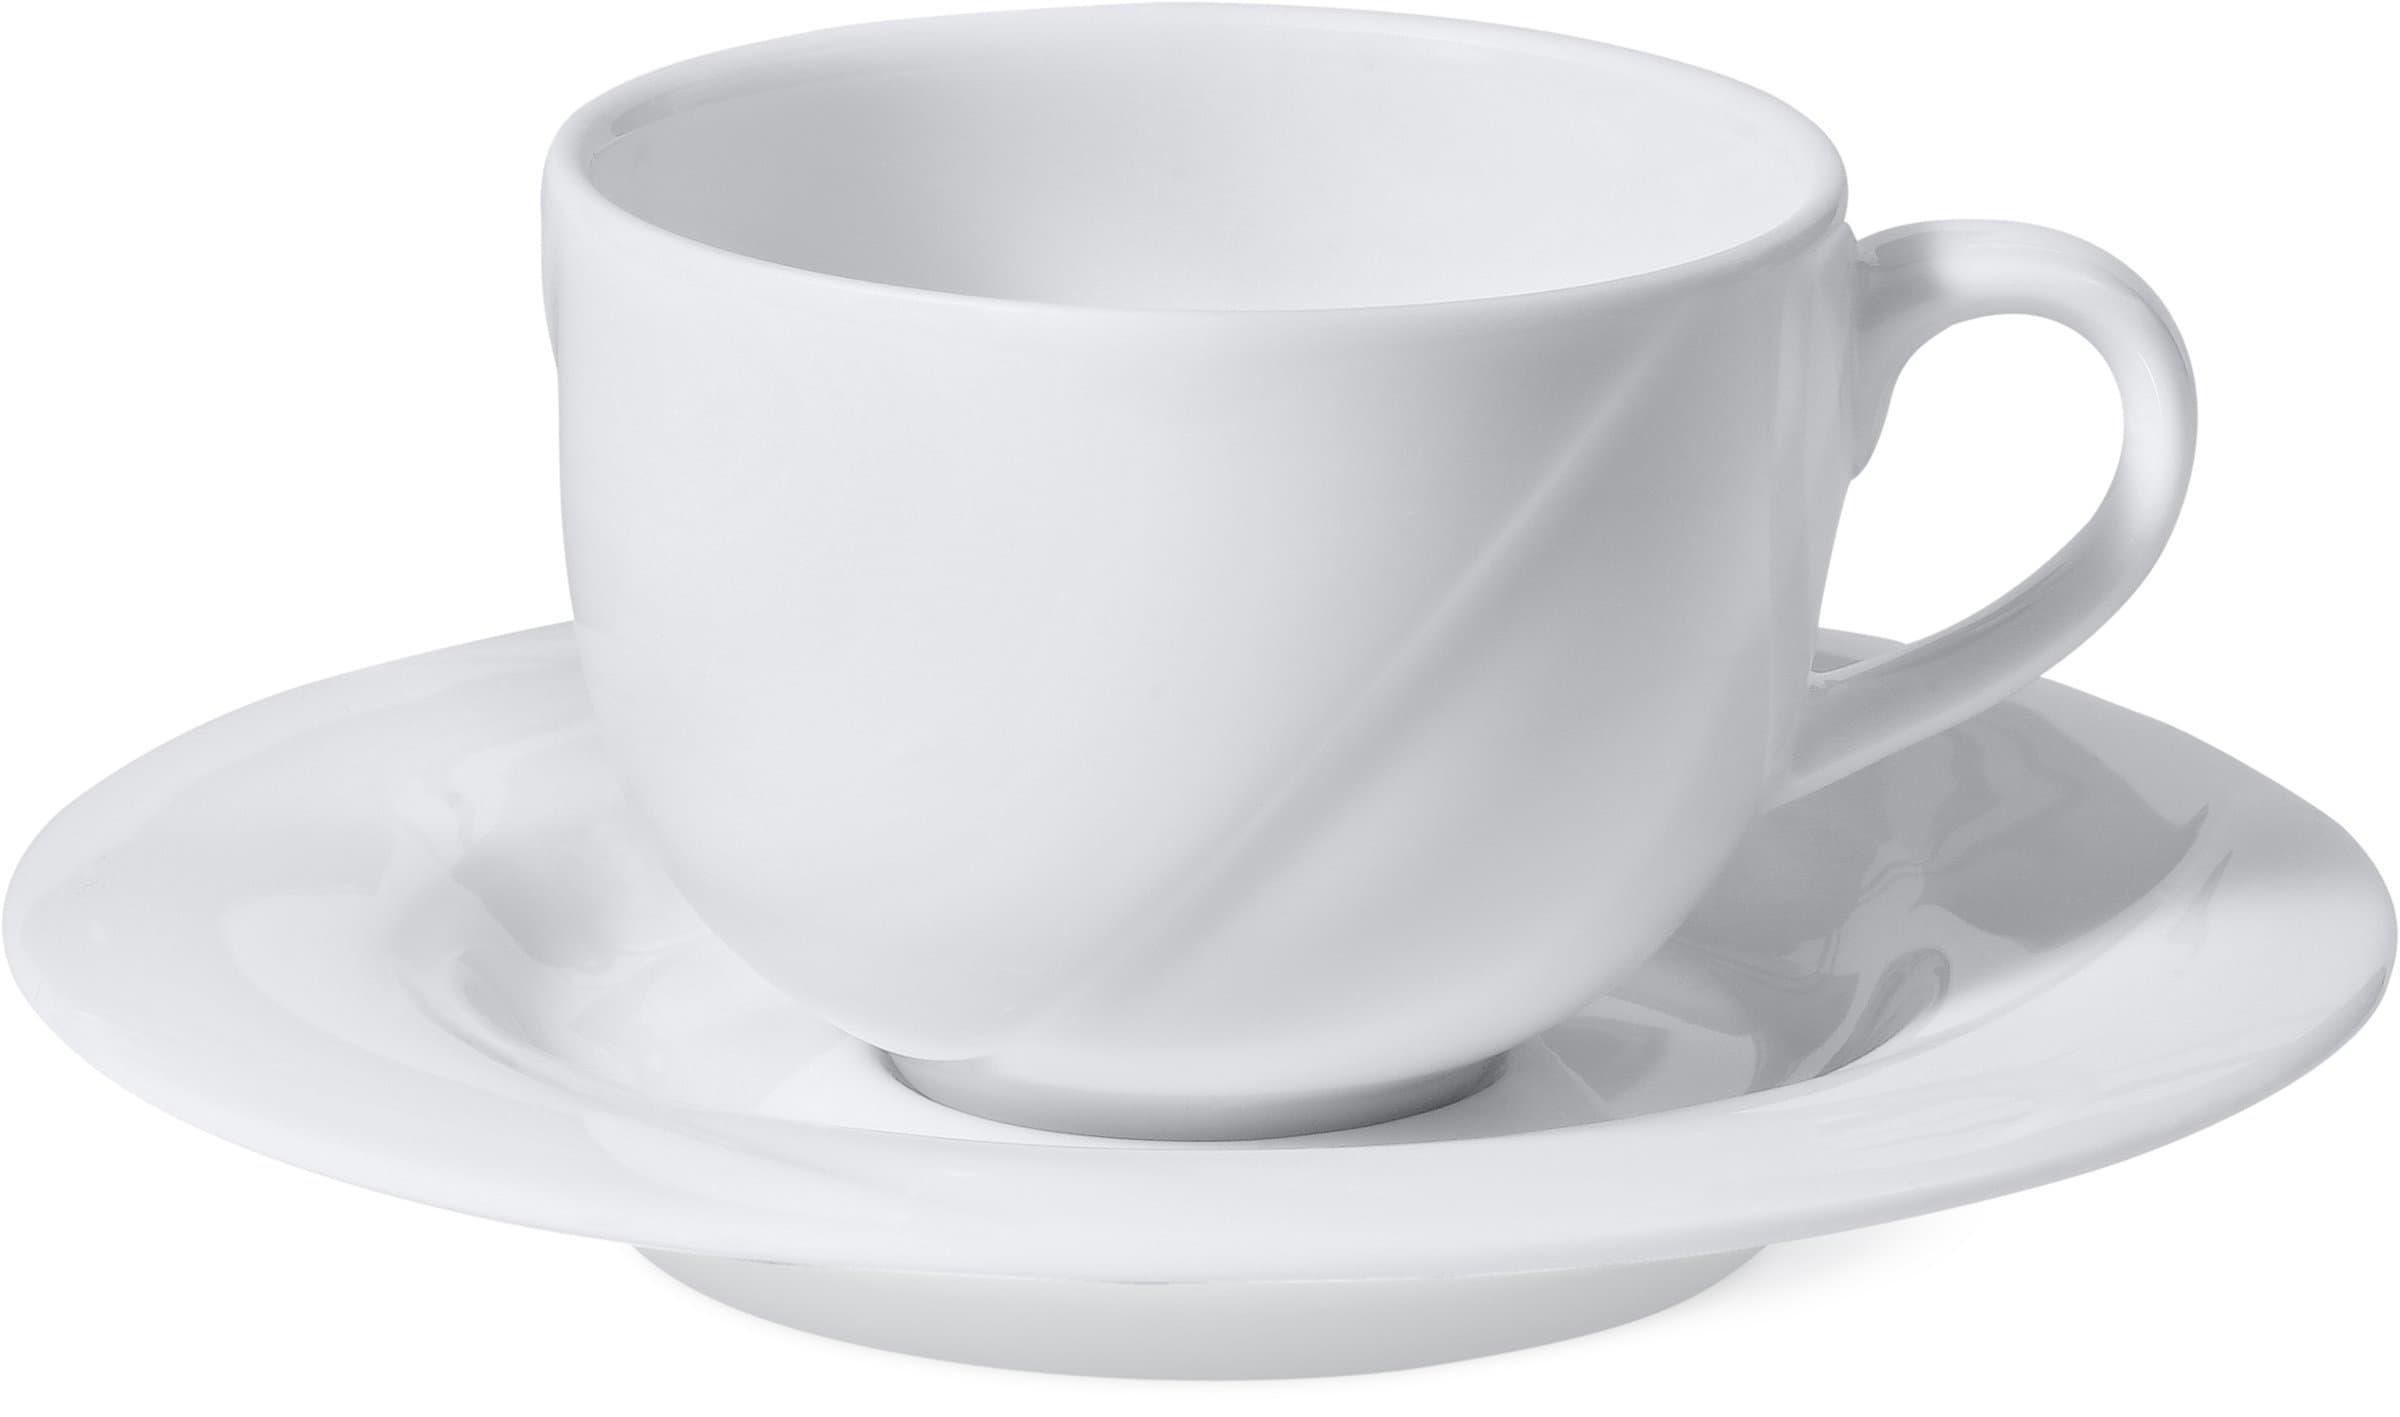 Cucina & Tavola NIKITA Tasse à espresso avec sous-tasse